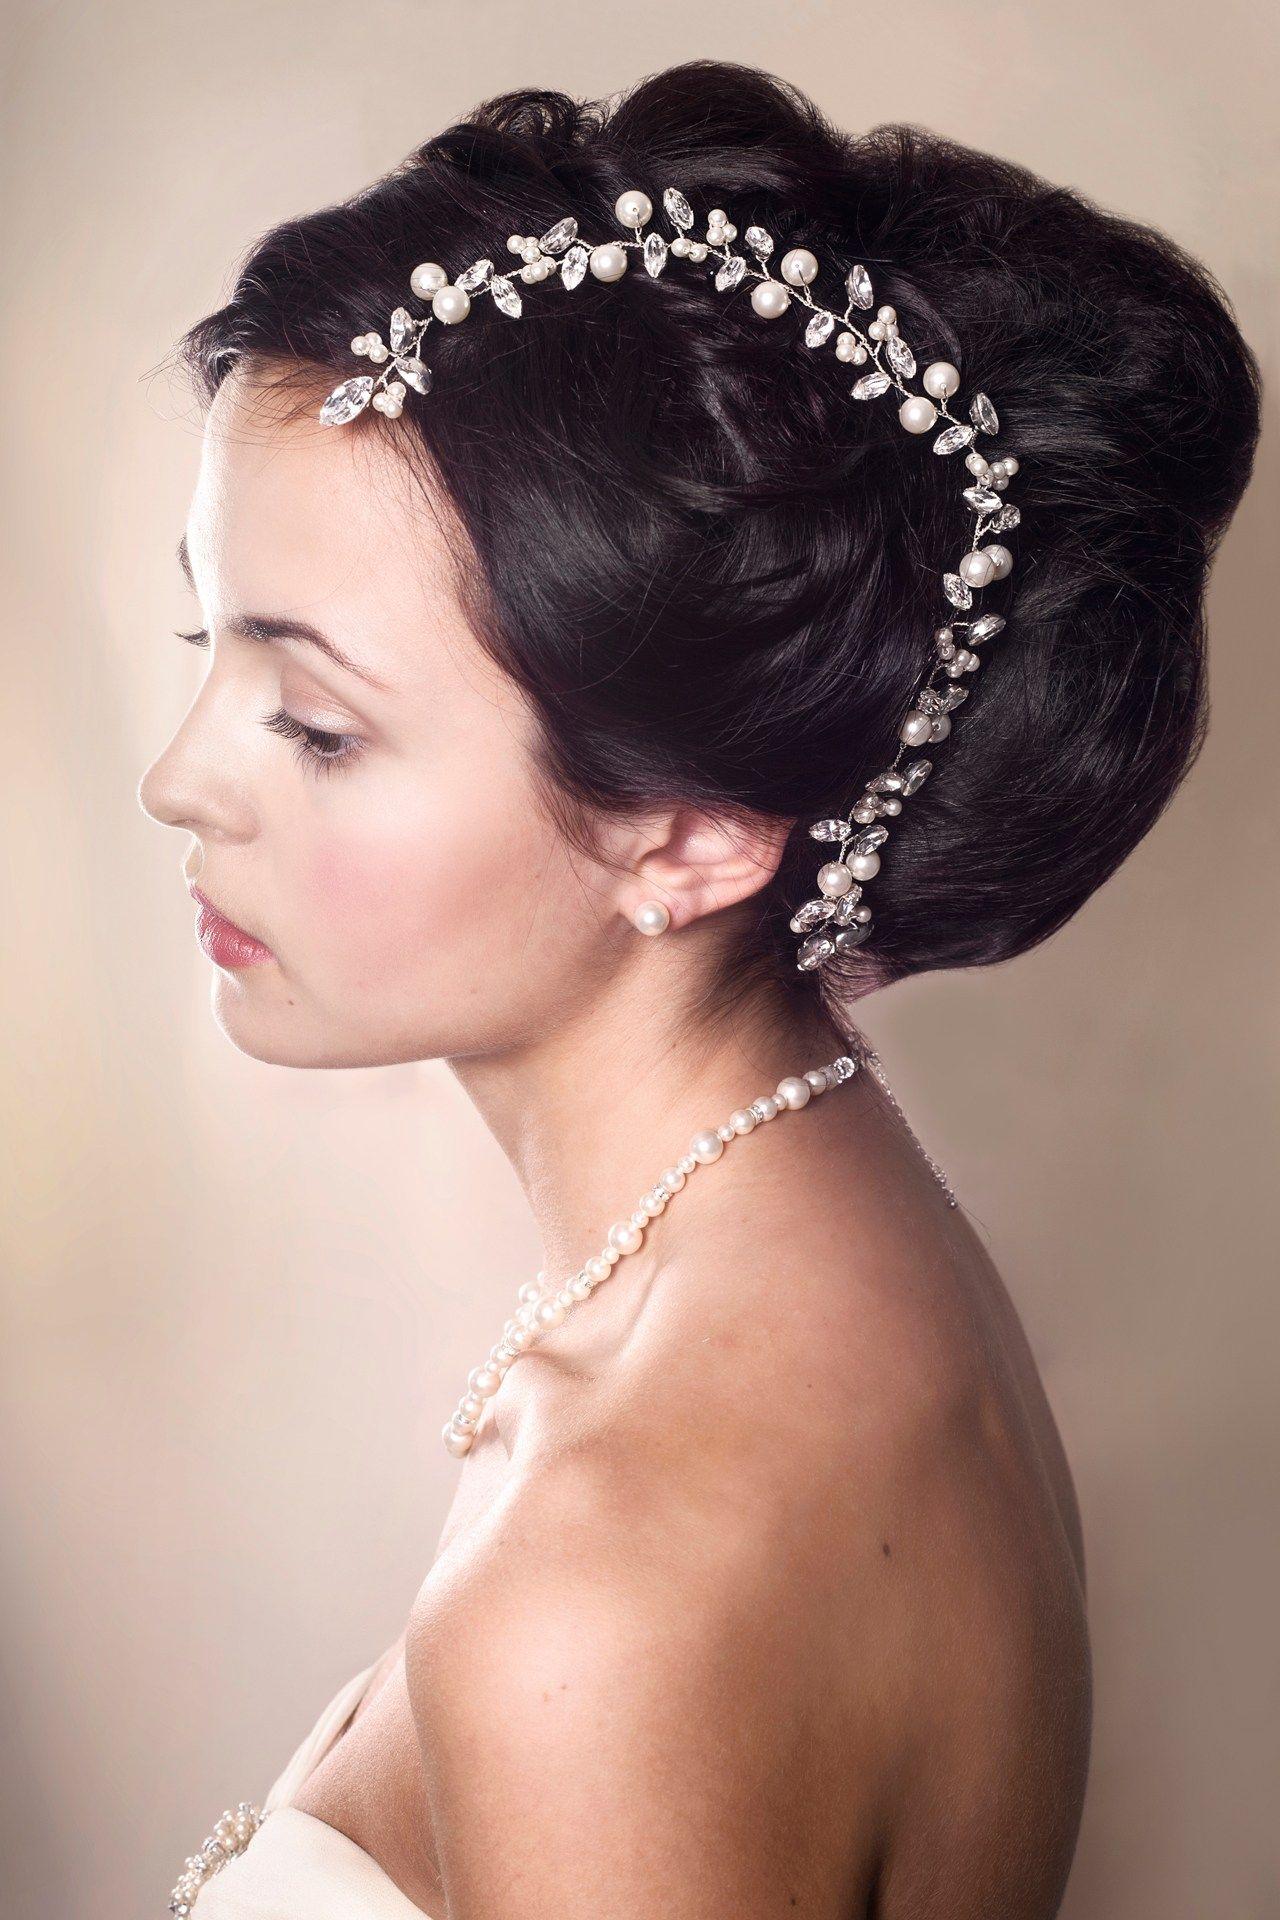 wedding ideas, planning & inspiration | bride | wedding